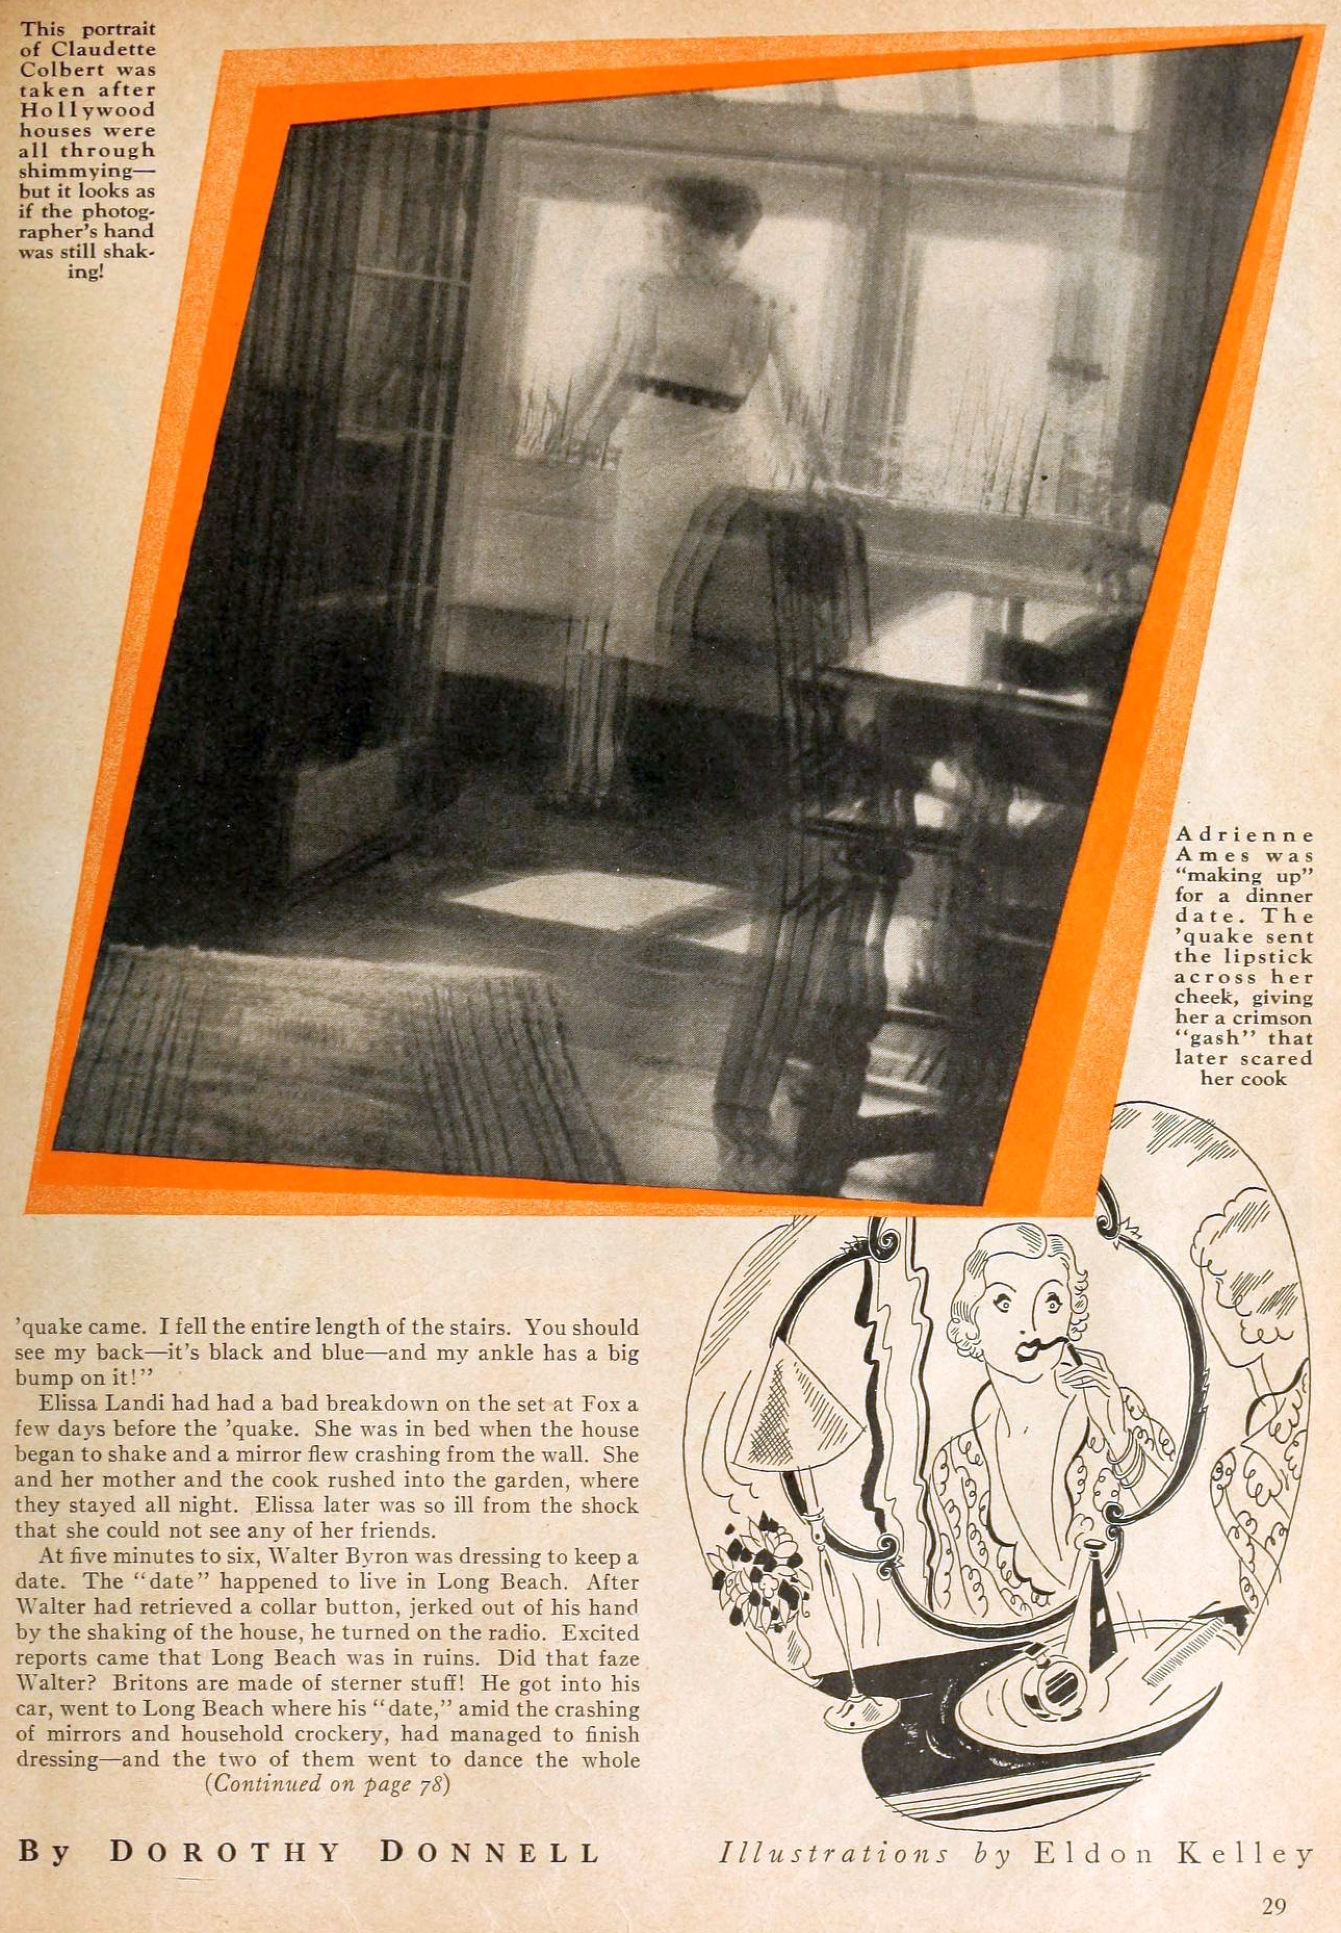 carole lombard motion picture june 1933 earthquake 01a